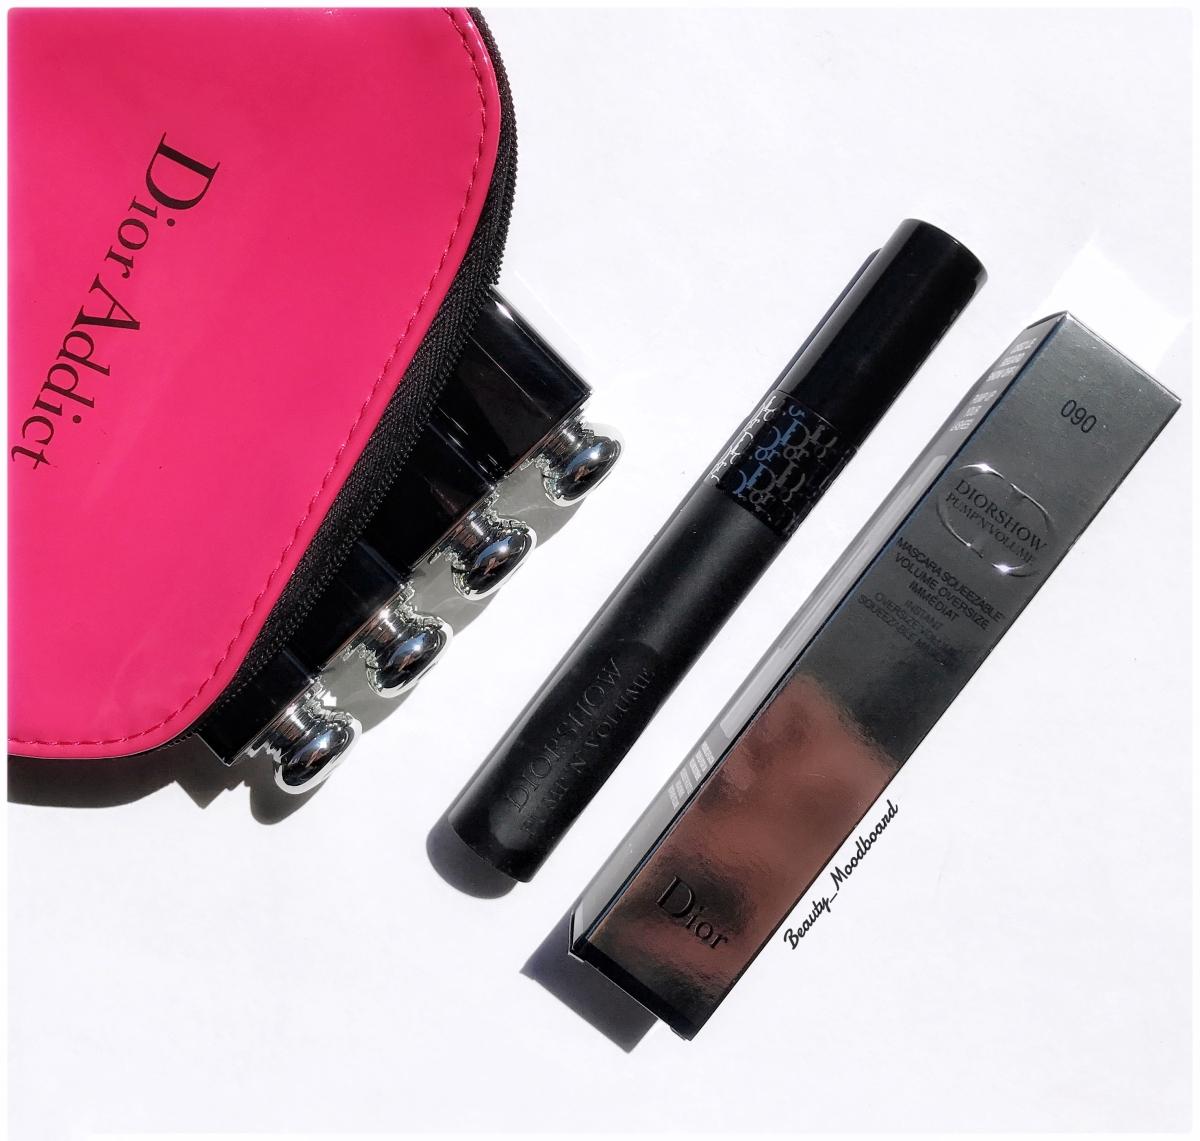 Mascara Diorshow Pump'N'Volume, Dior : Volume XXL ?